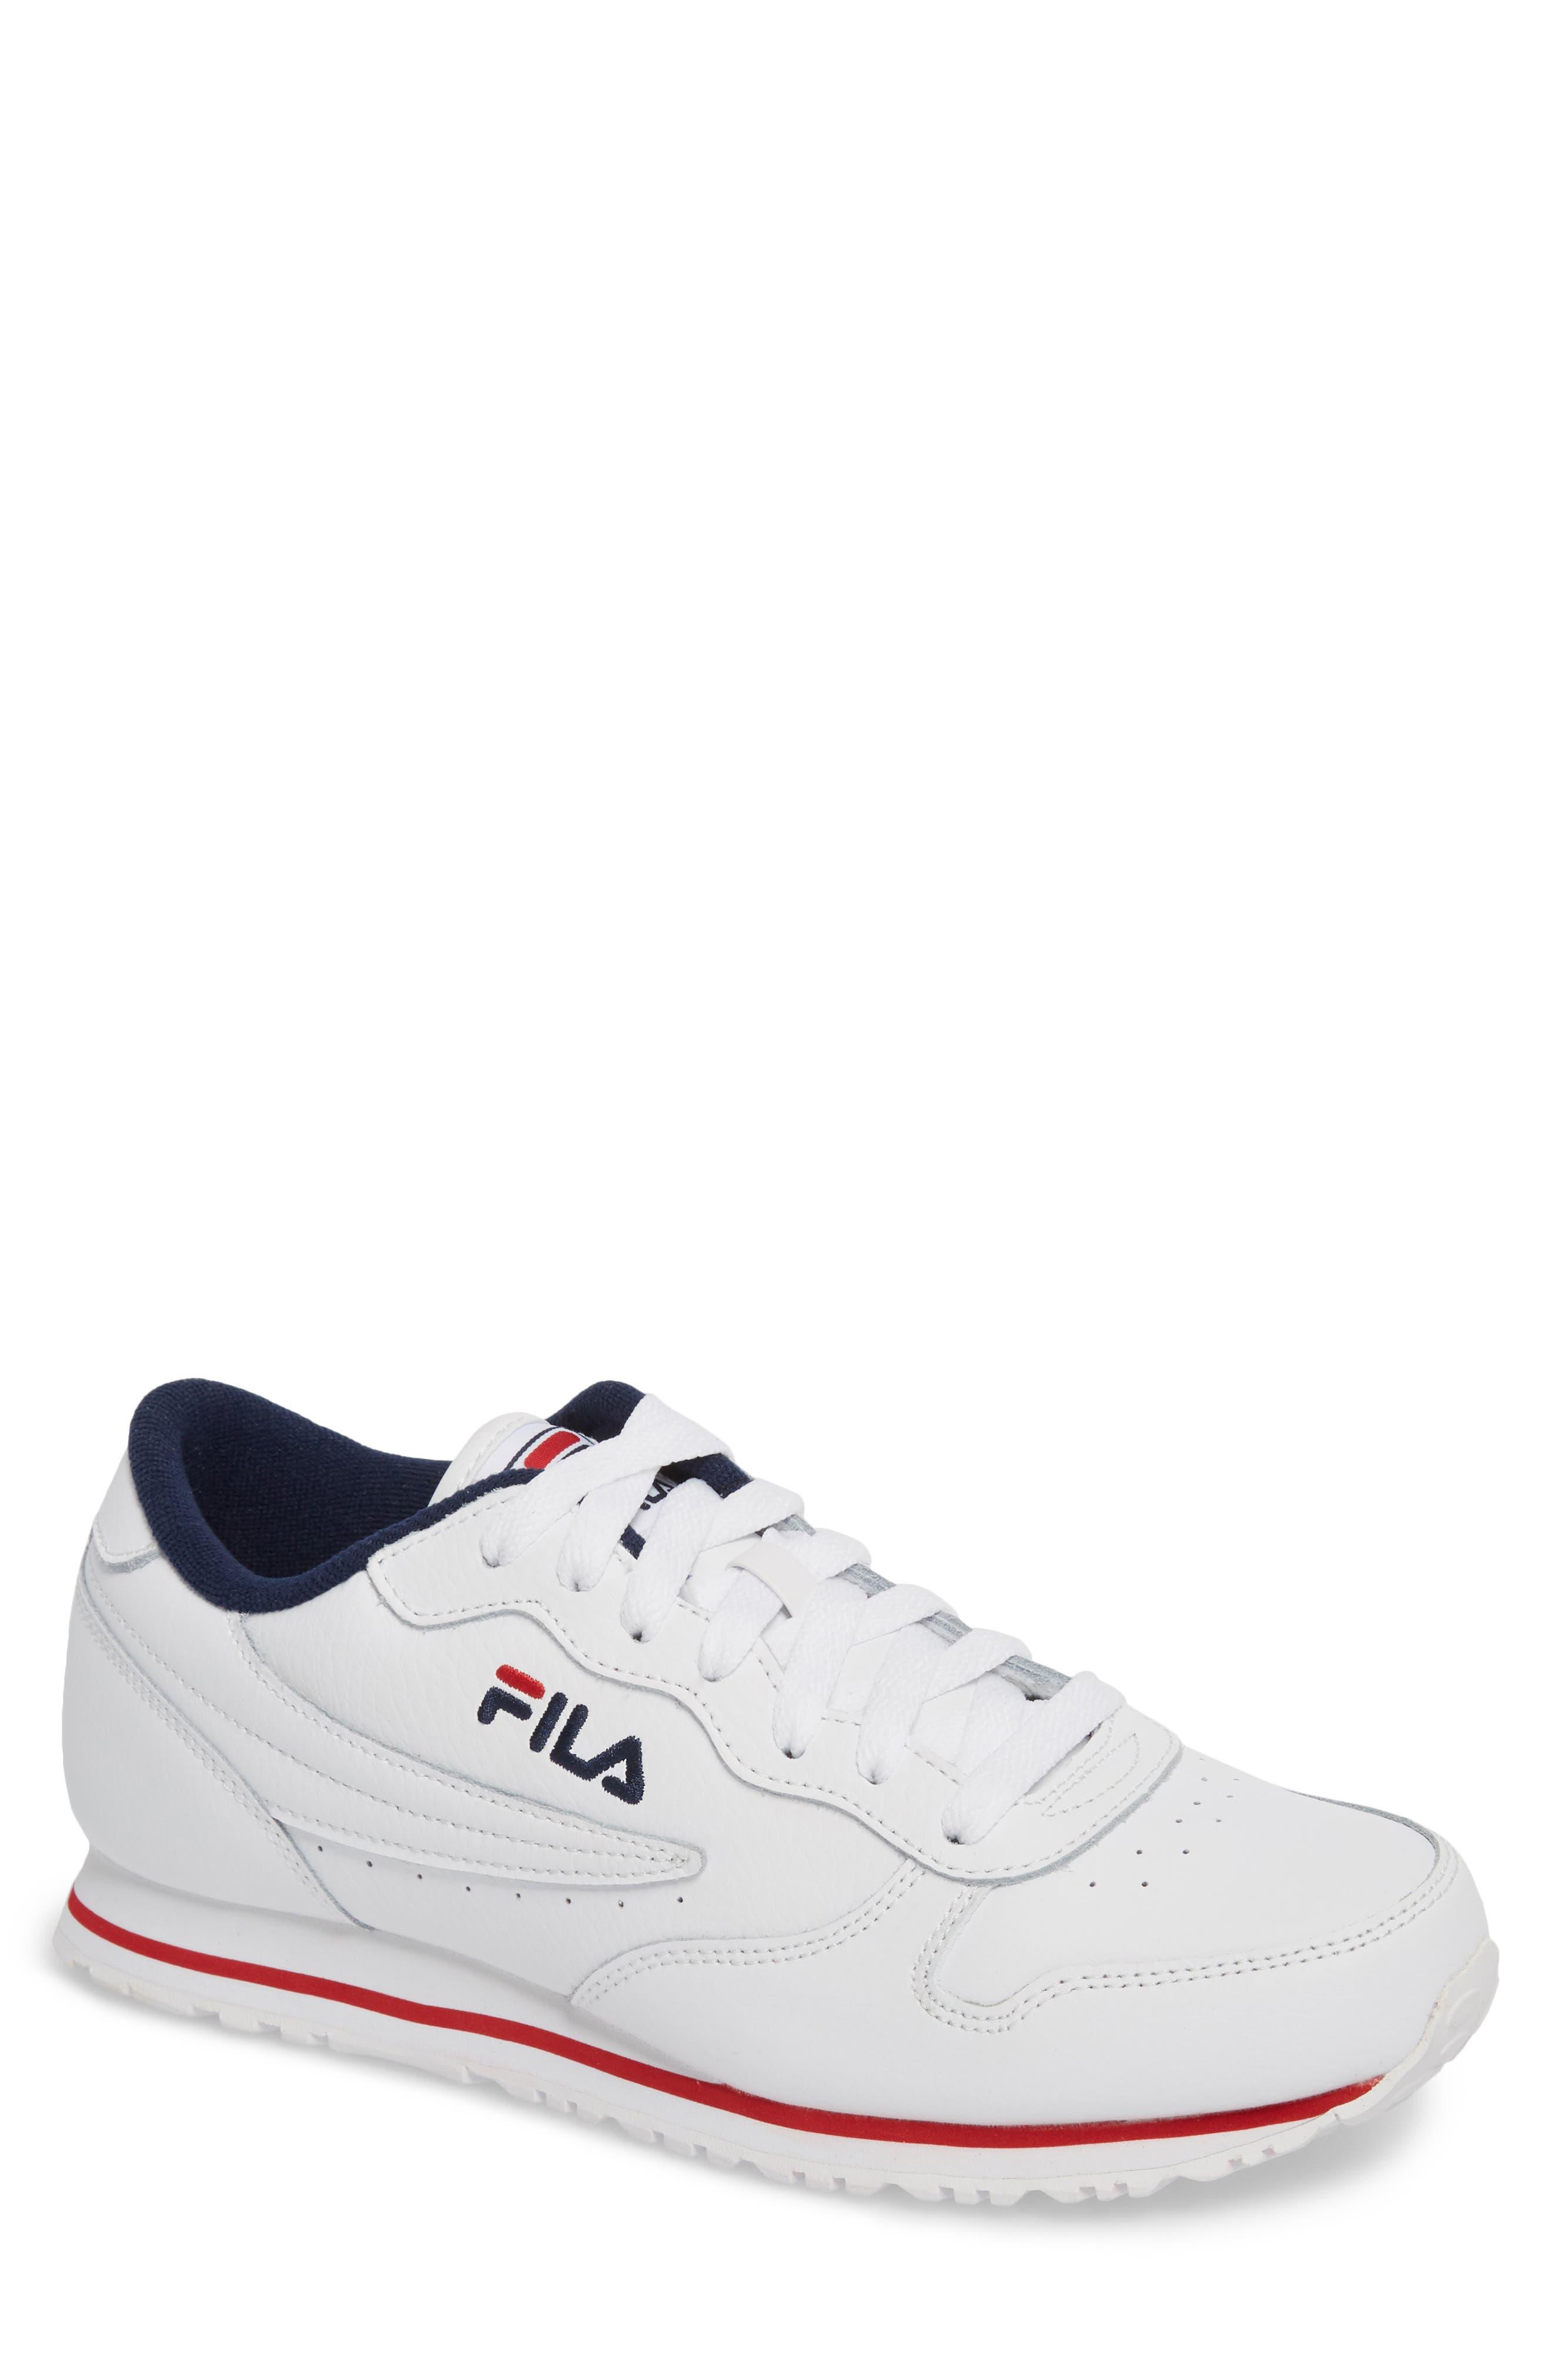 Fila Euro Jogger Sneaker In White  Navy  Red  f2b850c6e